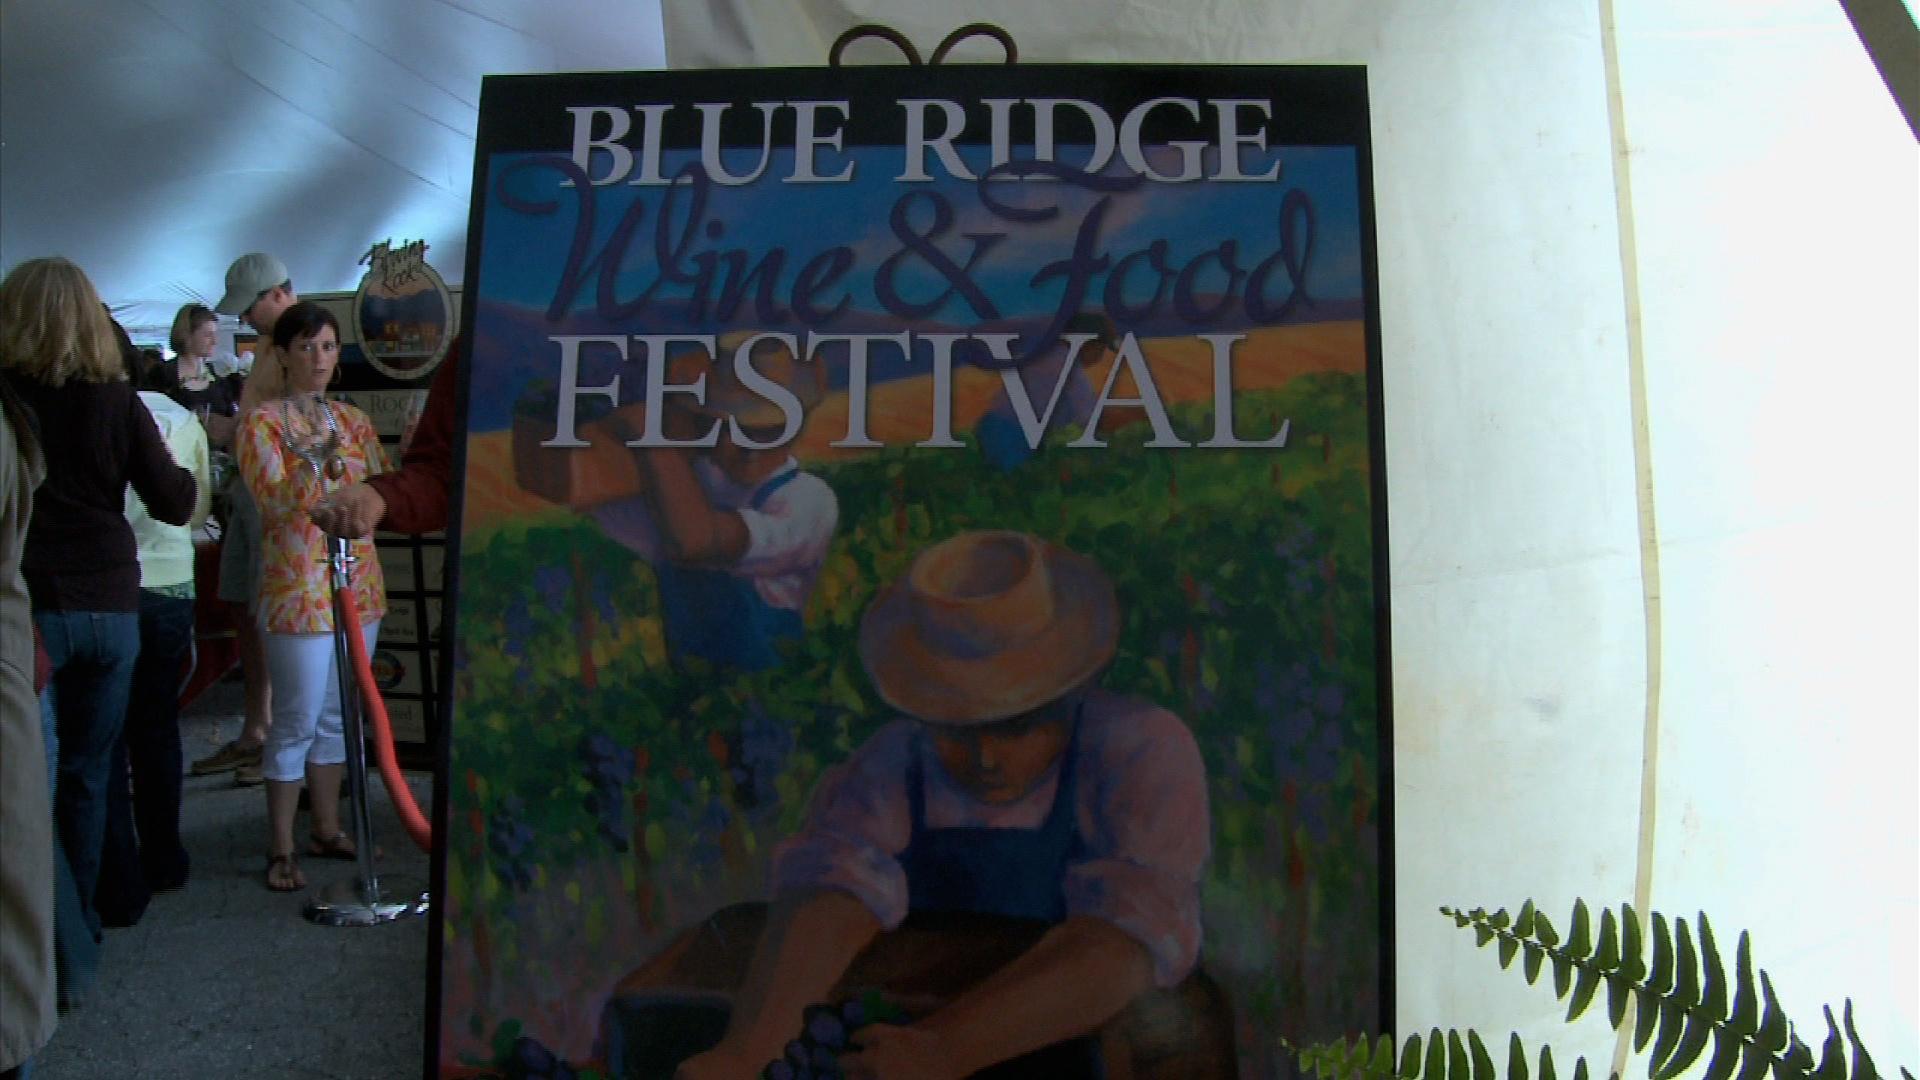 Blue Ridge Wine and Food Festival image